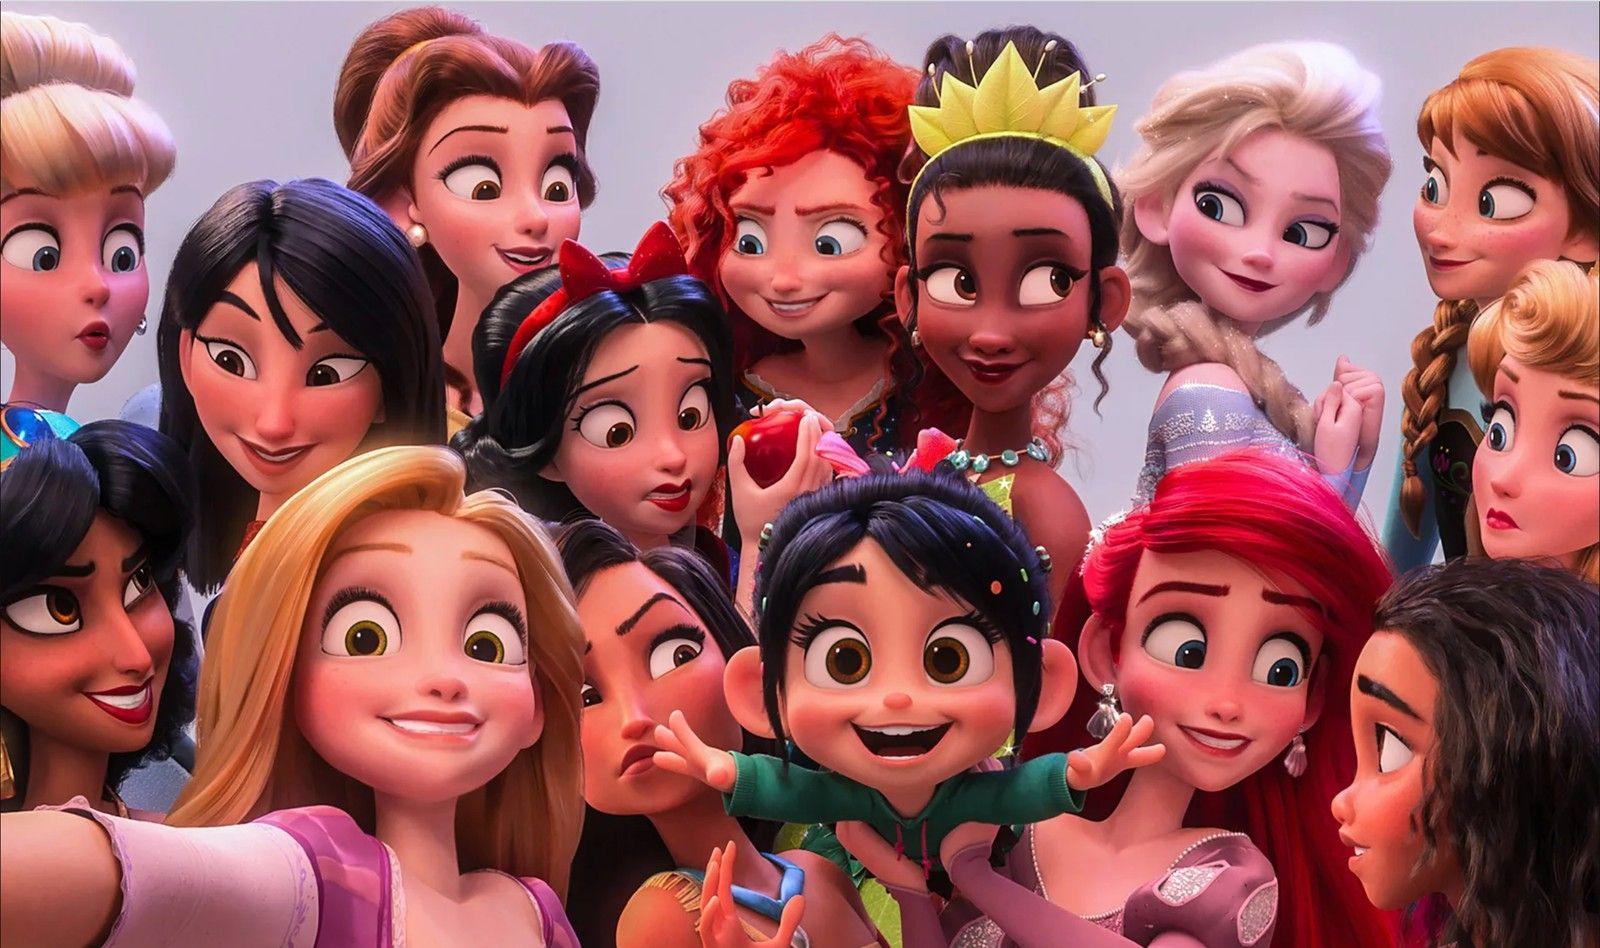 Pin By Nadaghadabougdid On Hello In 2020 Disney Princess Movies Disney Princess Terrifying Horror Movies